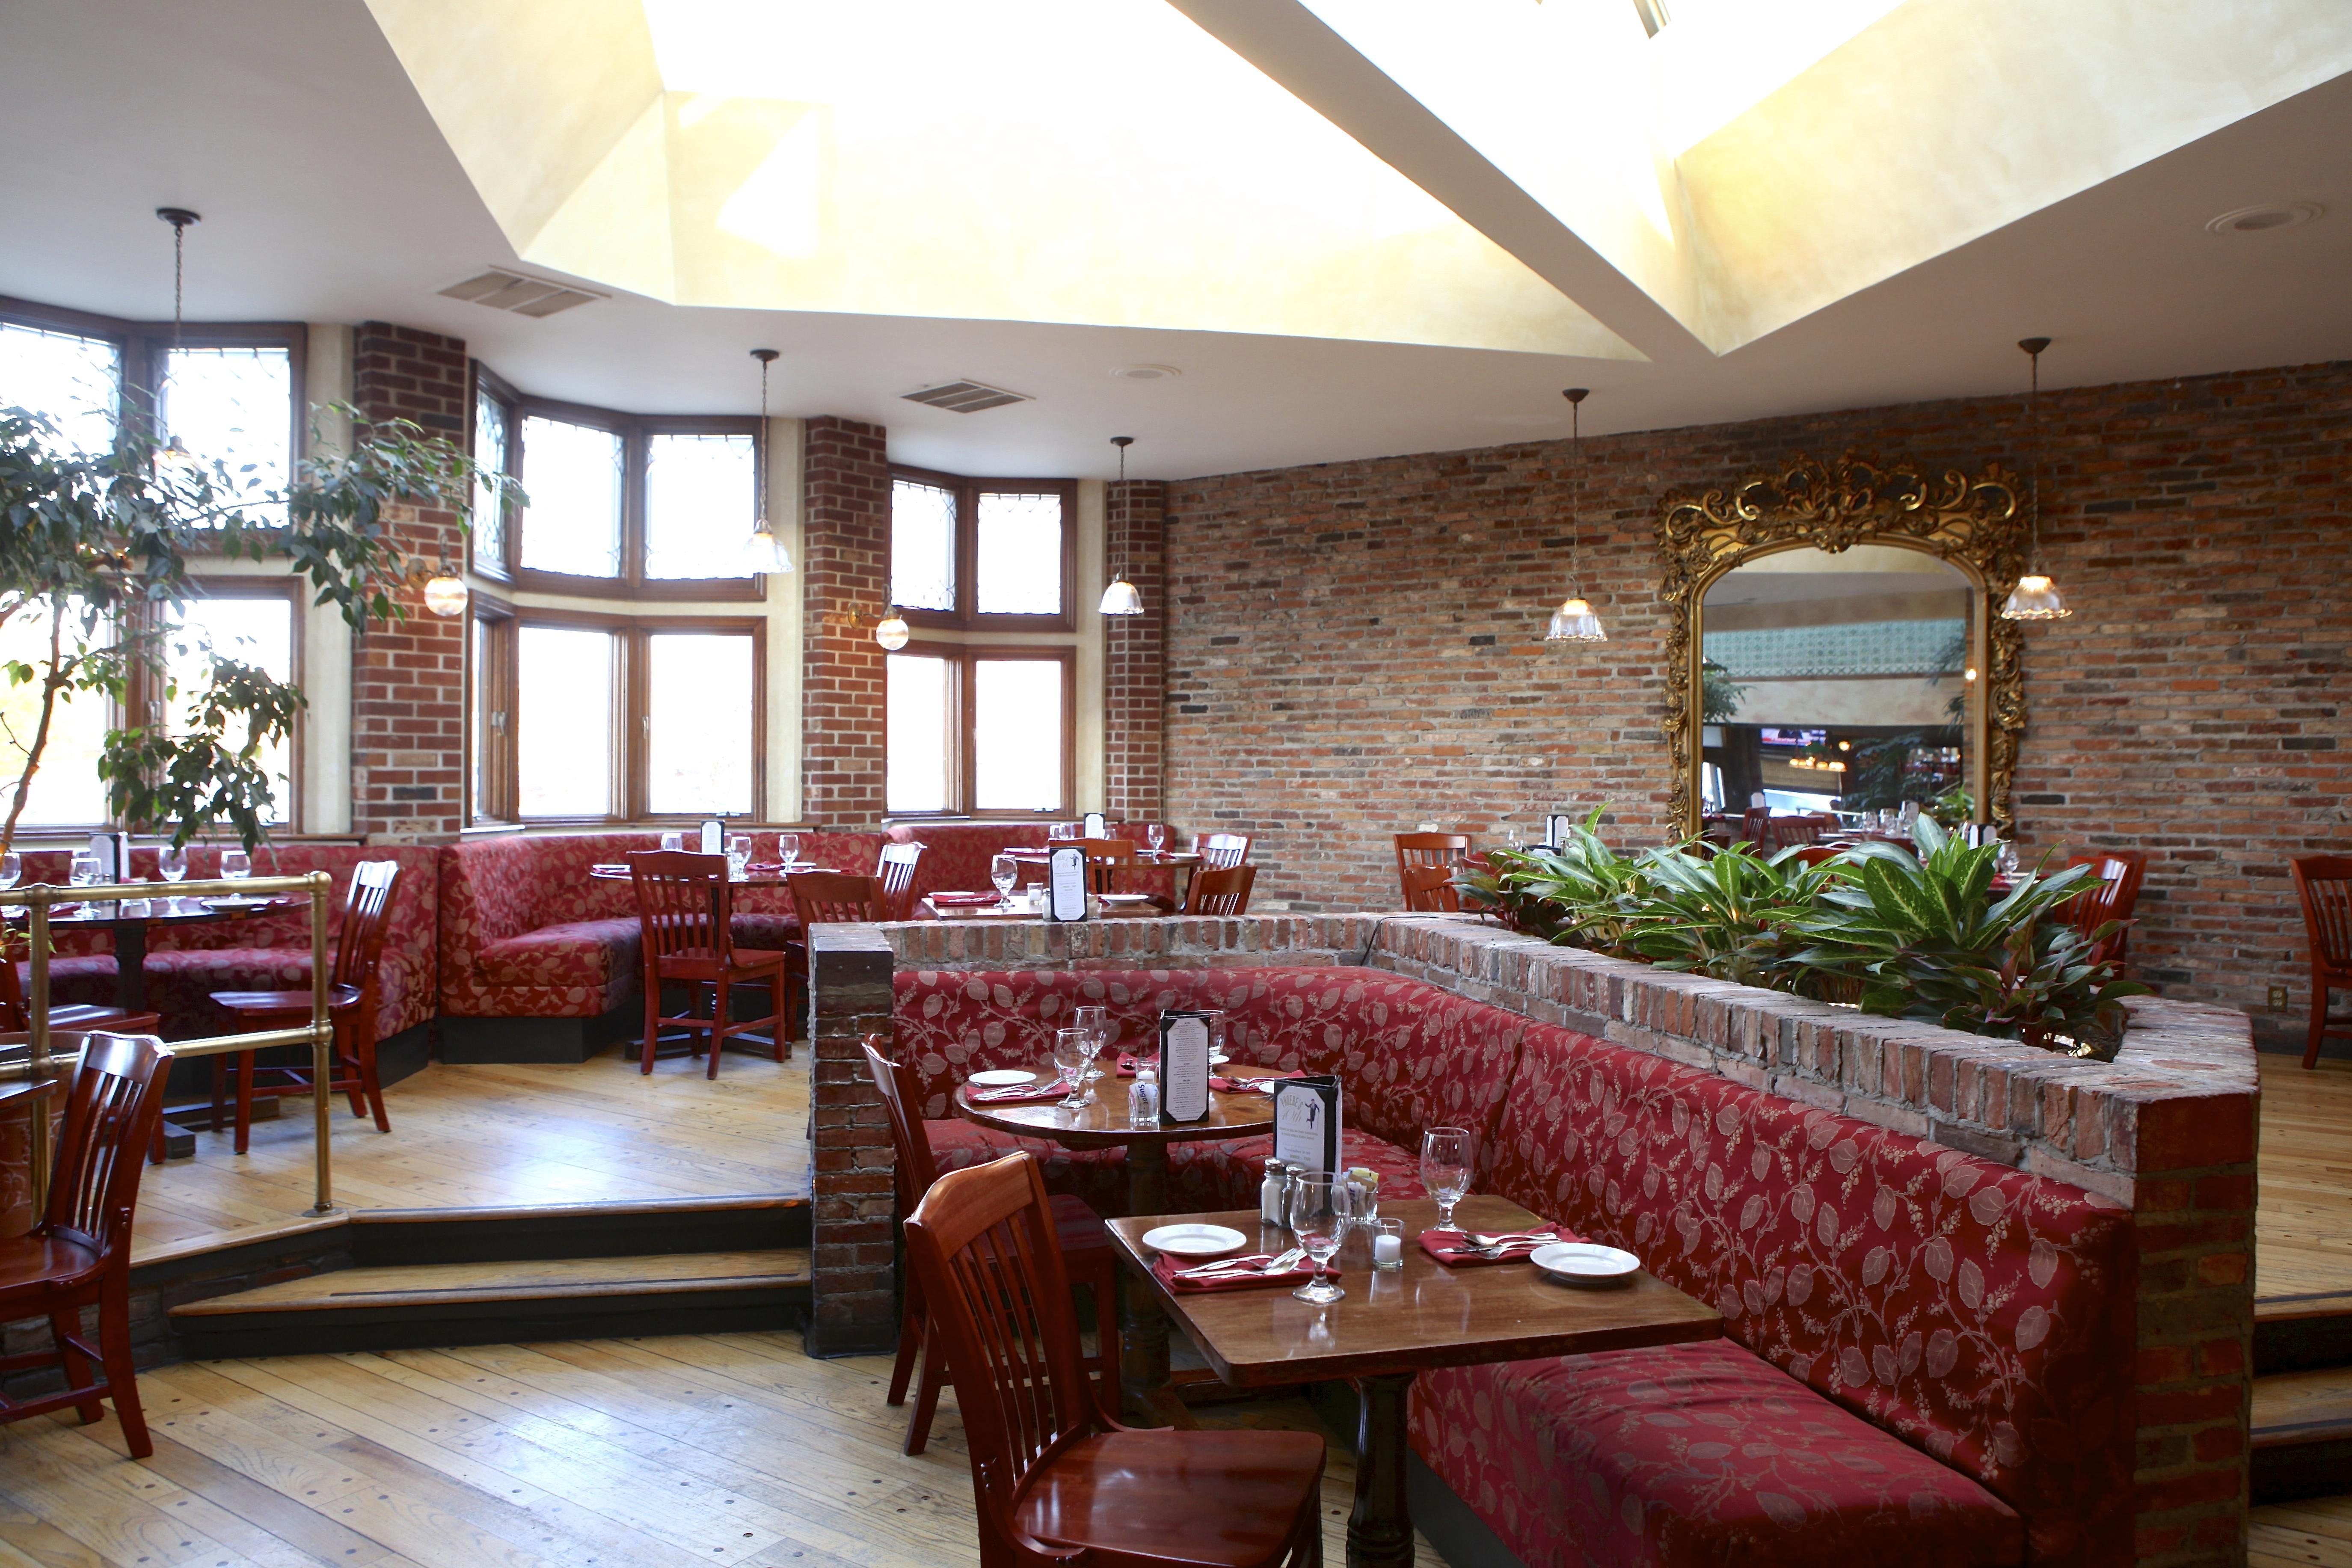 Atrium dining room at Phoebe's